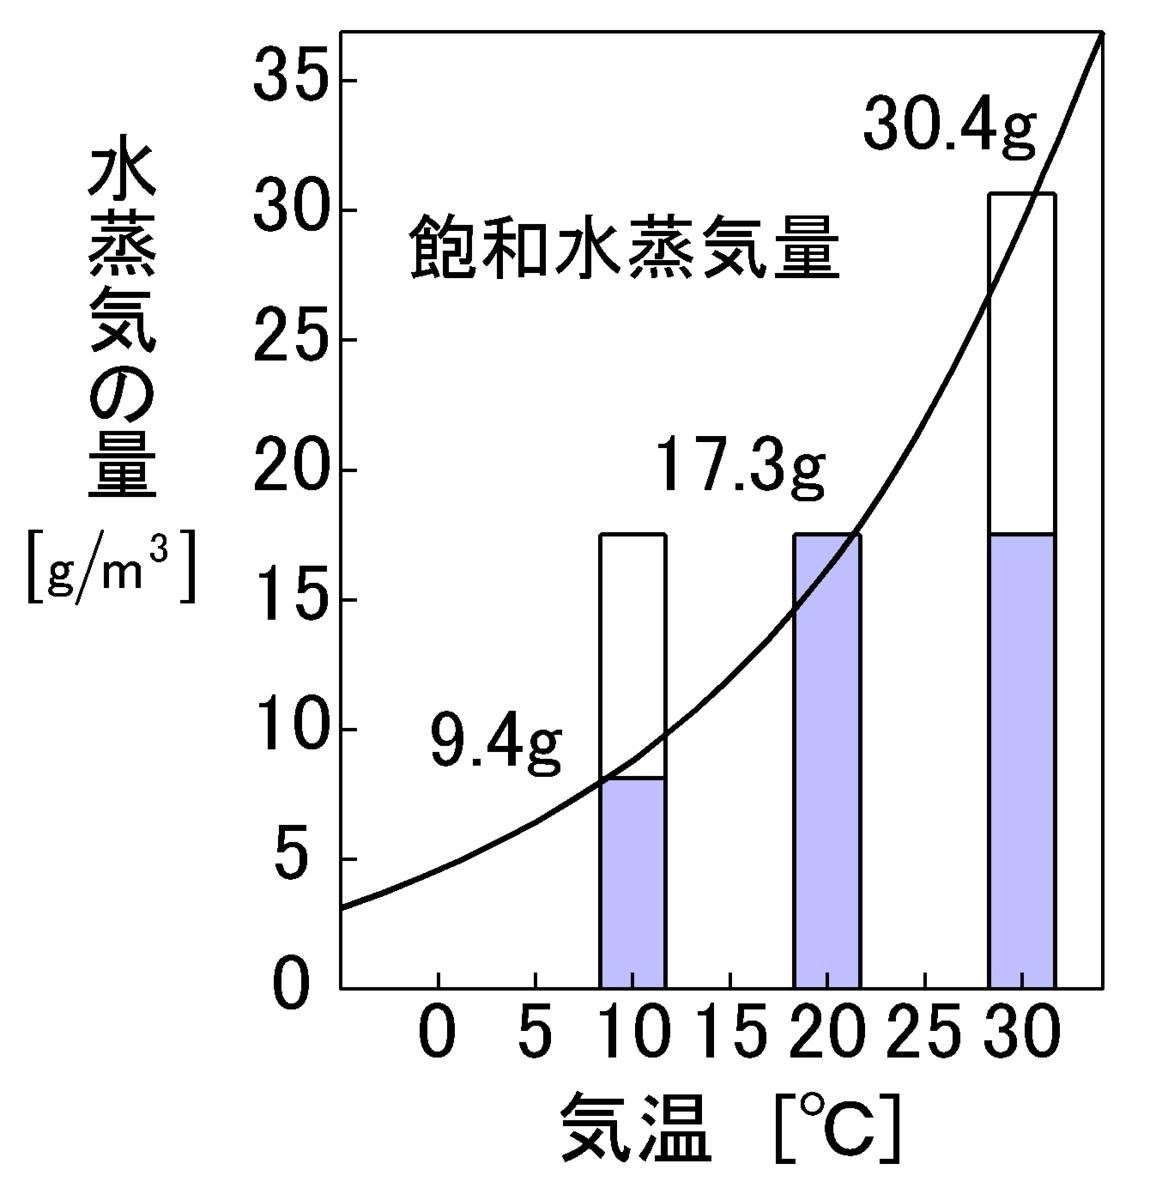 f:id:shusensei:20200326151740p:plain